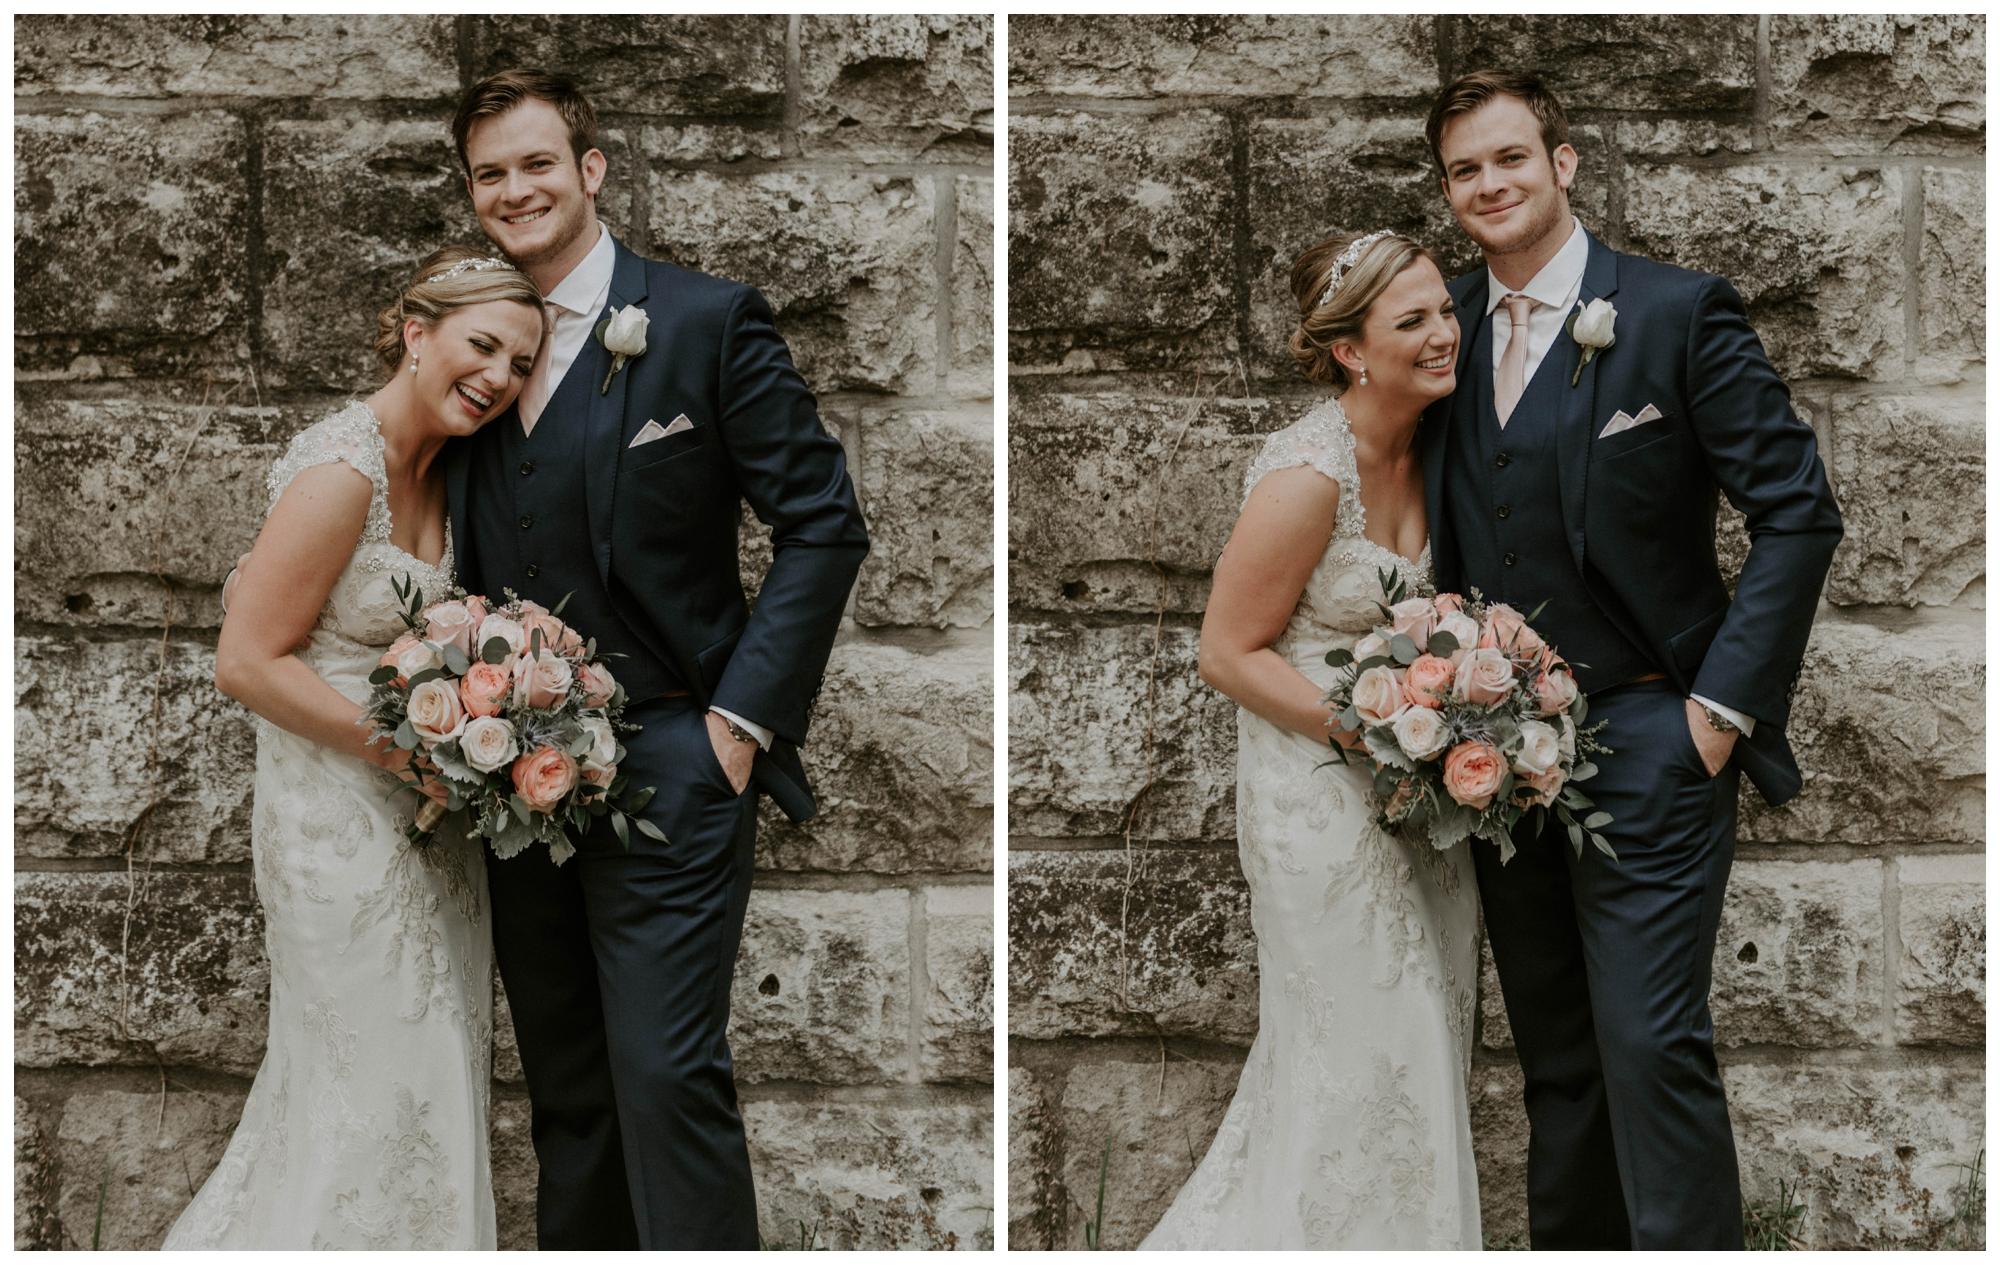 austin-texas-wedding-photography-1778-photographie_0095.jpg